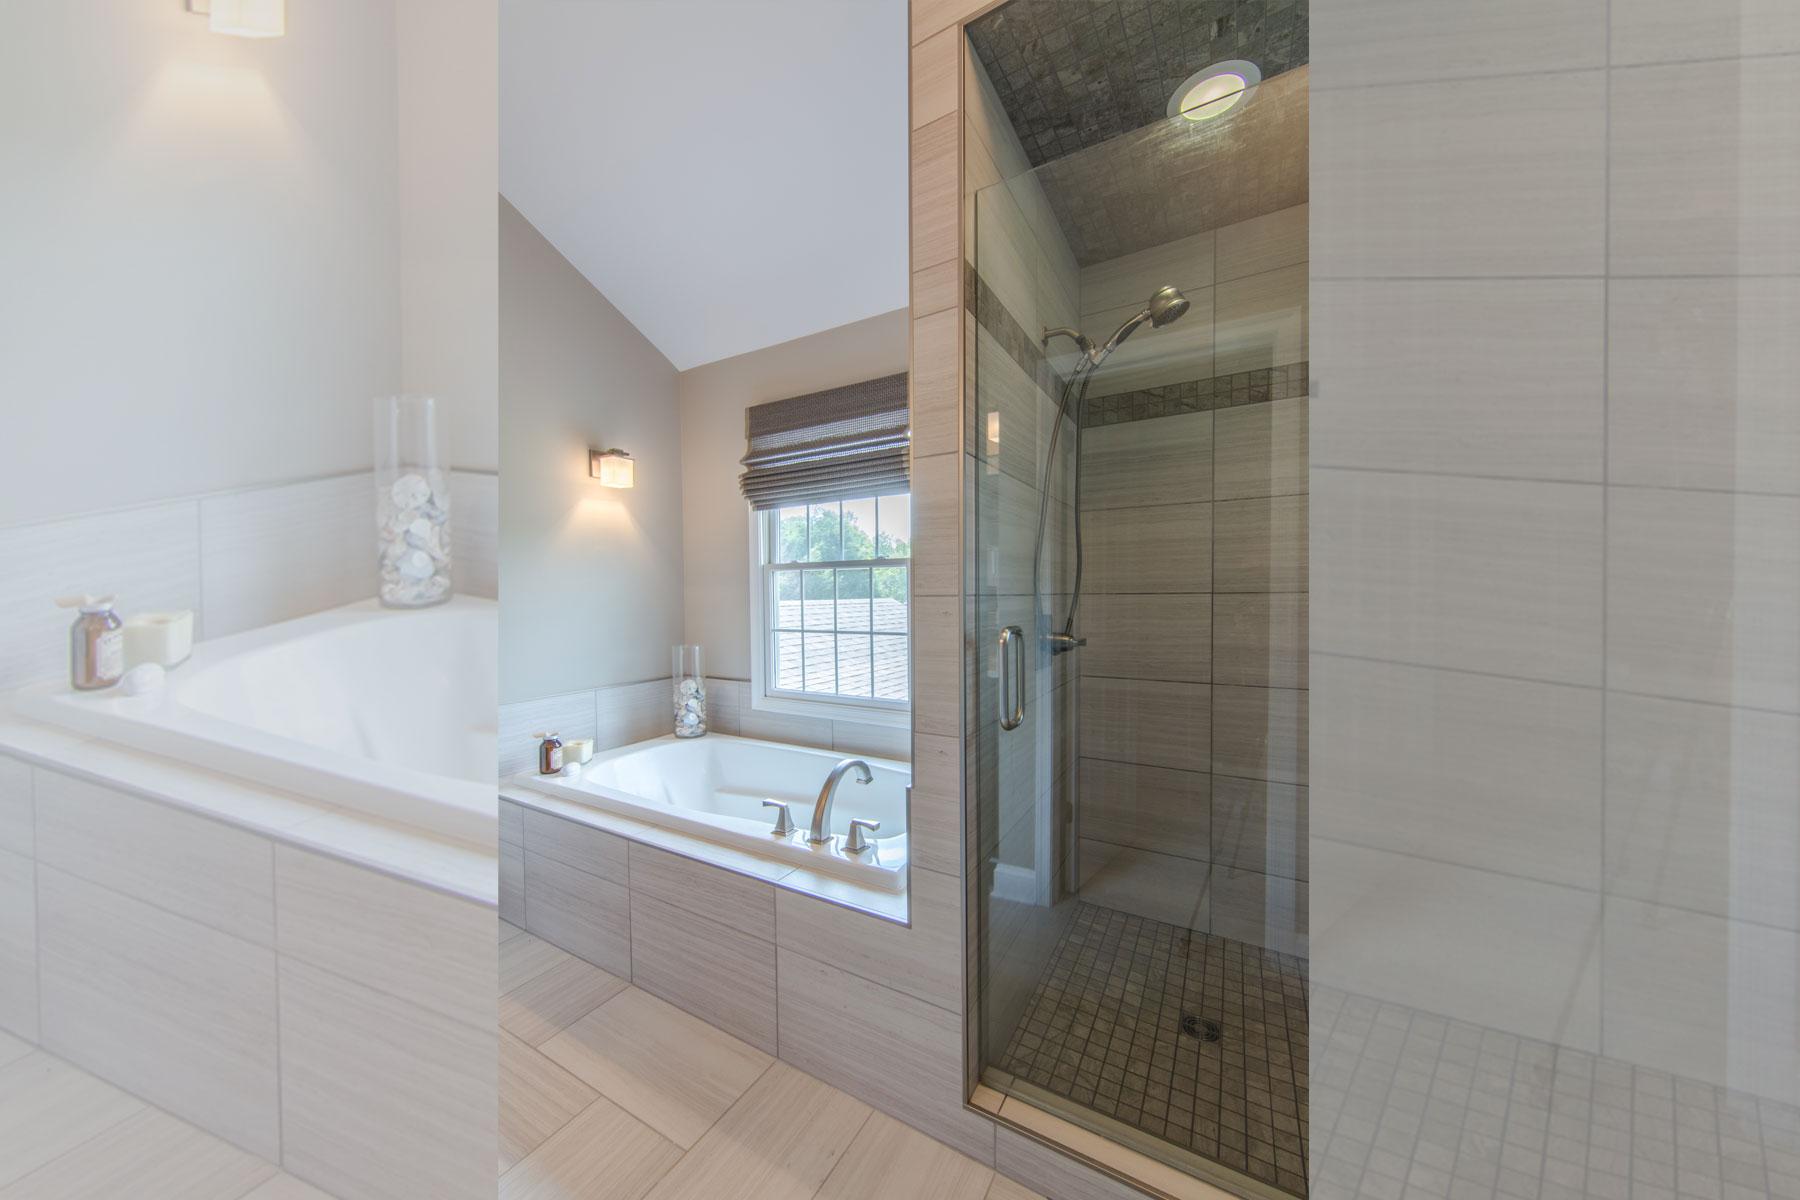 renovated-master-bath-tub-next-to-shower